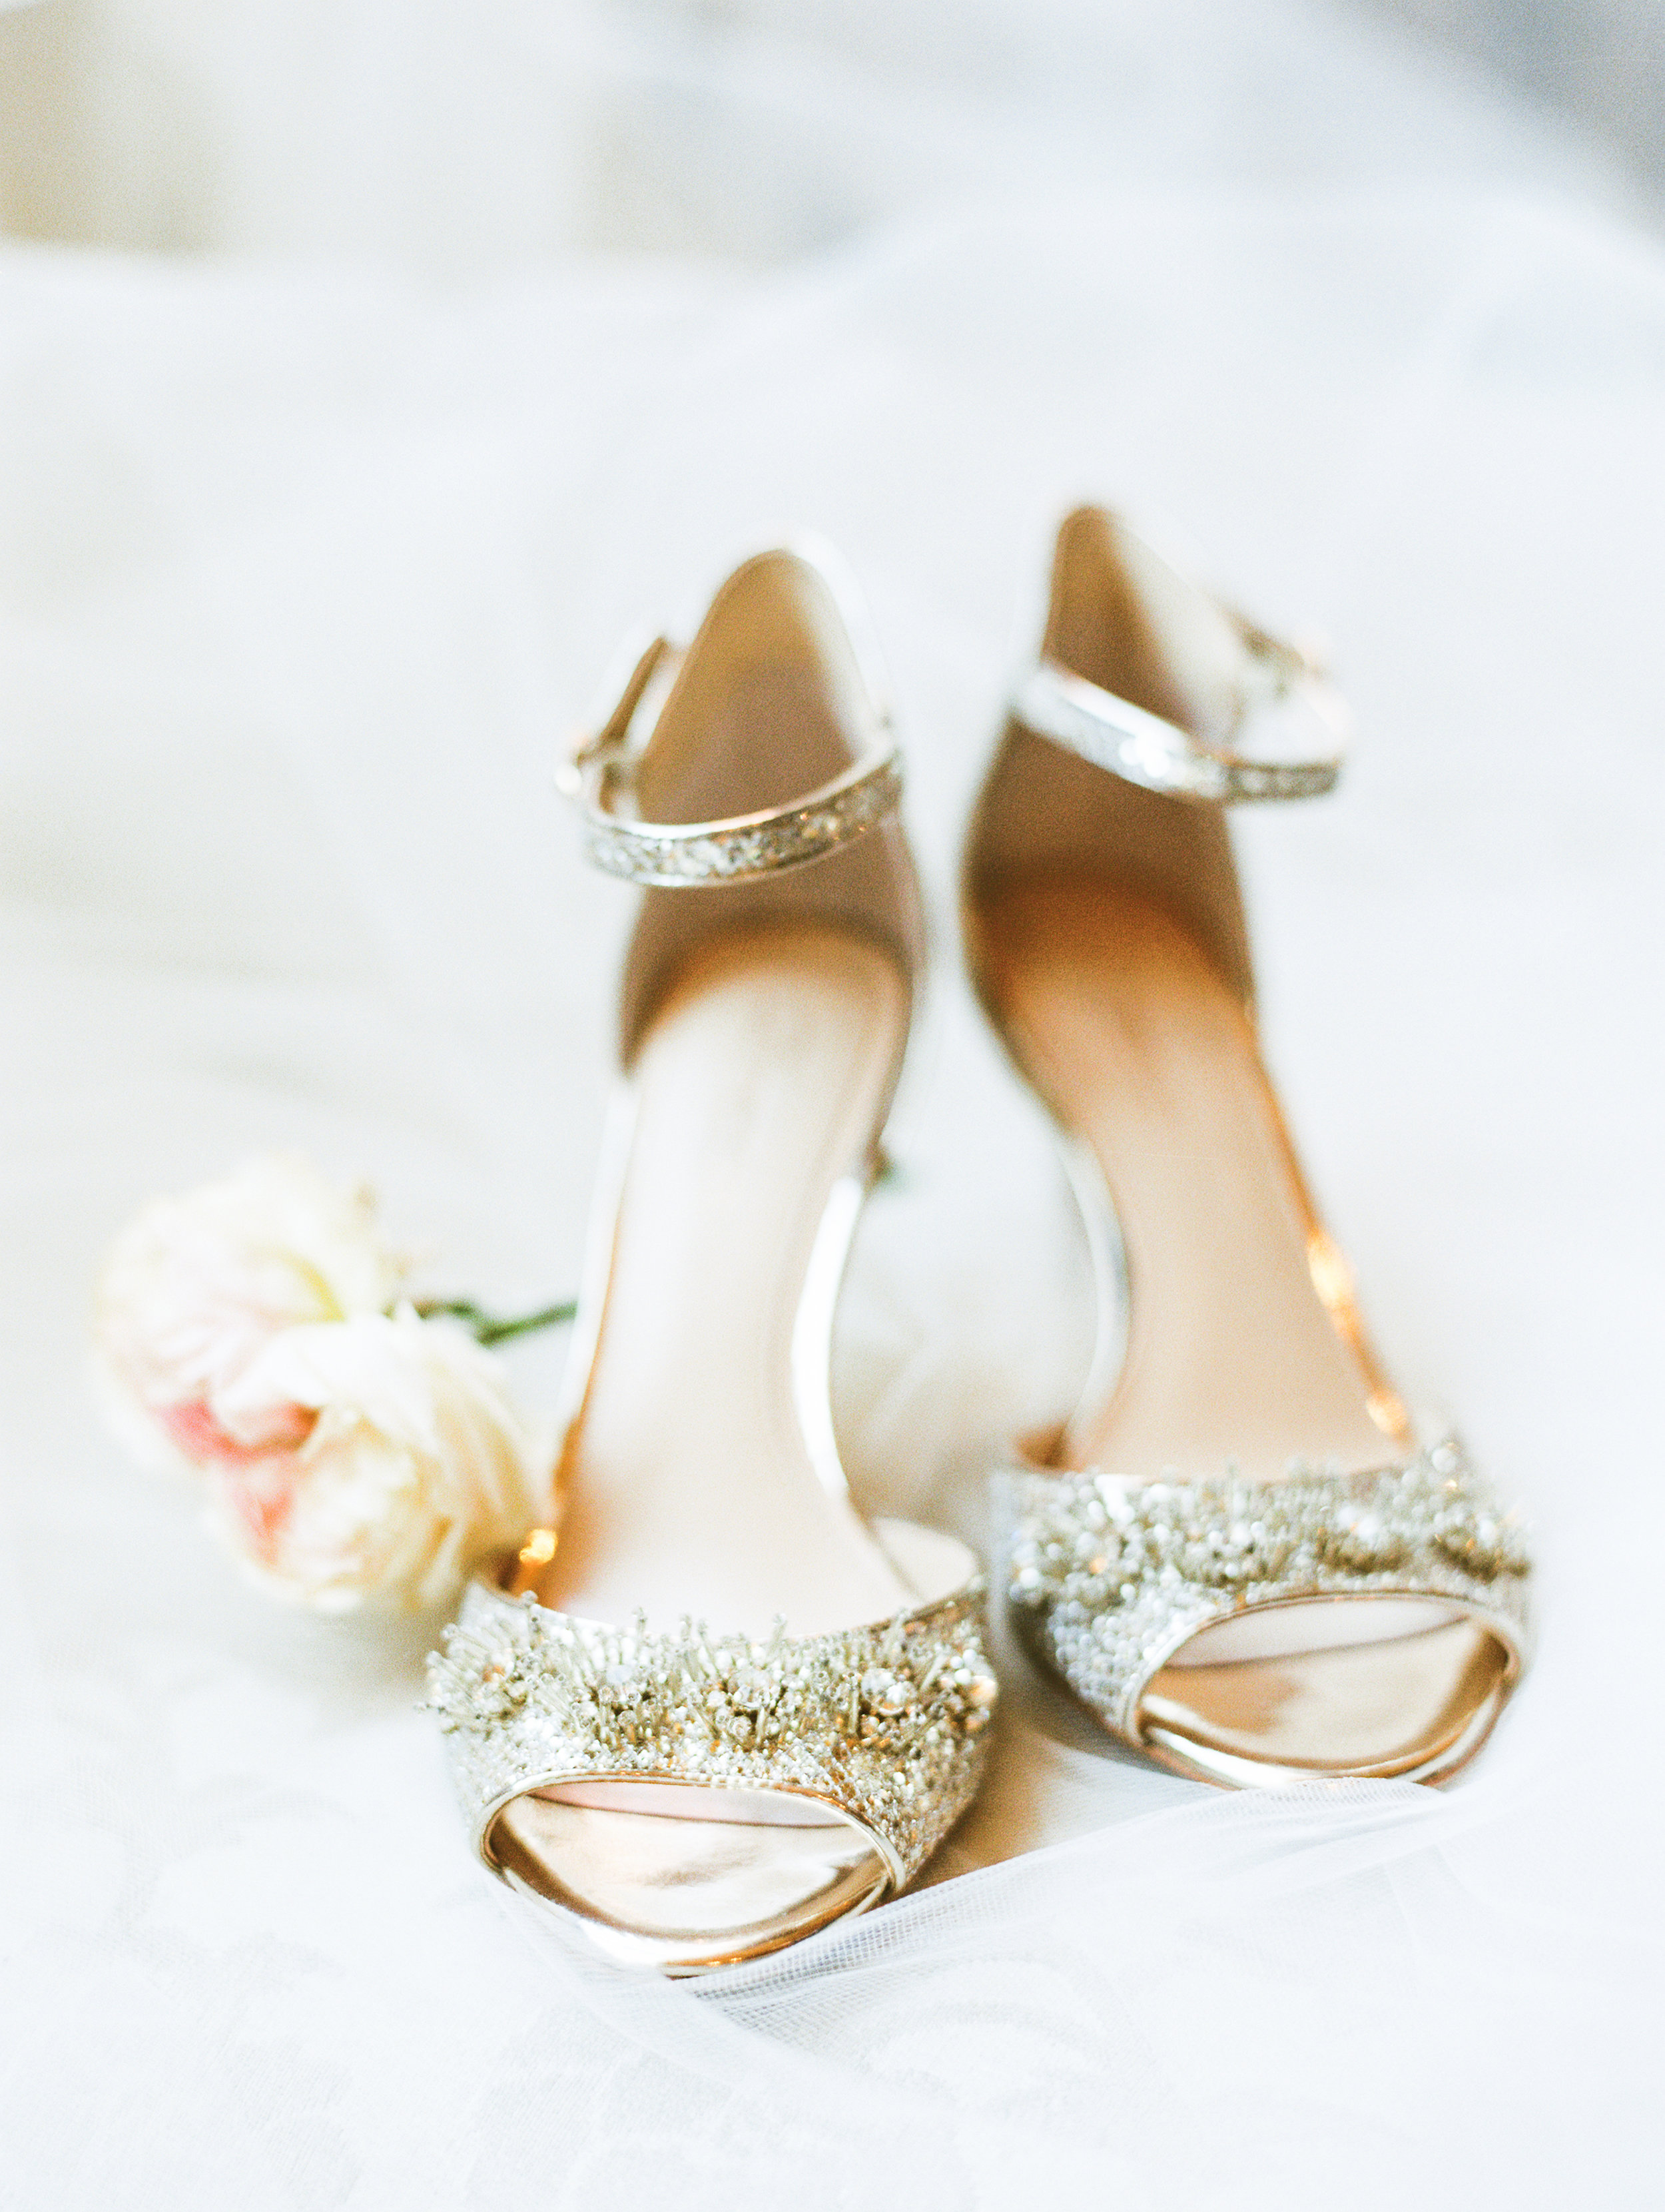 Vogelzang+Wedding+Details+b-41.jpg